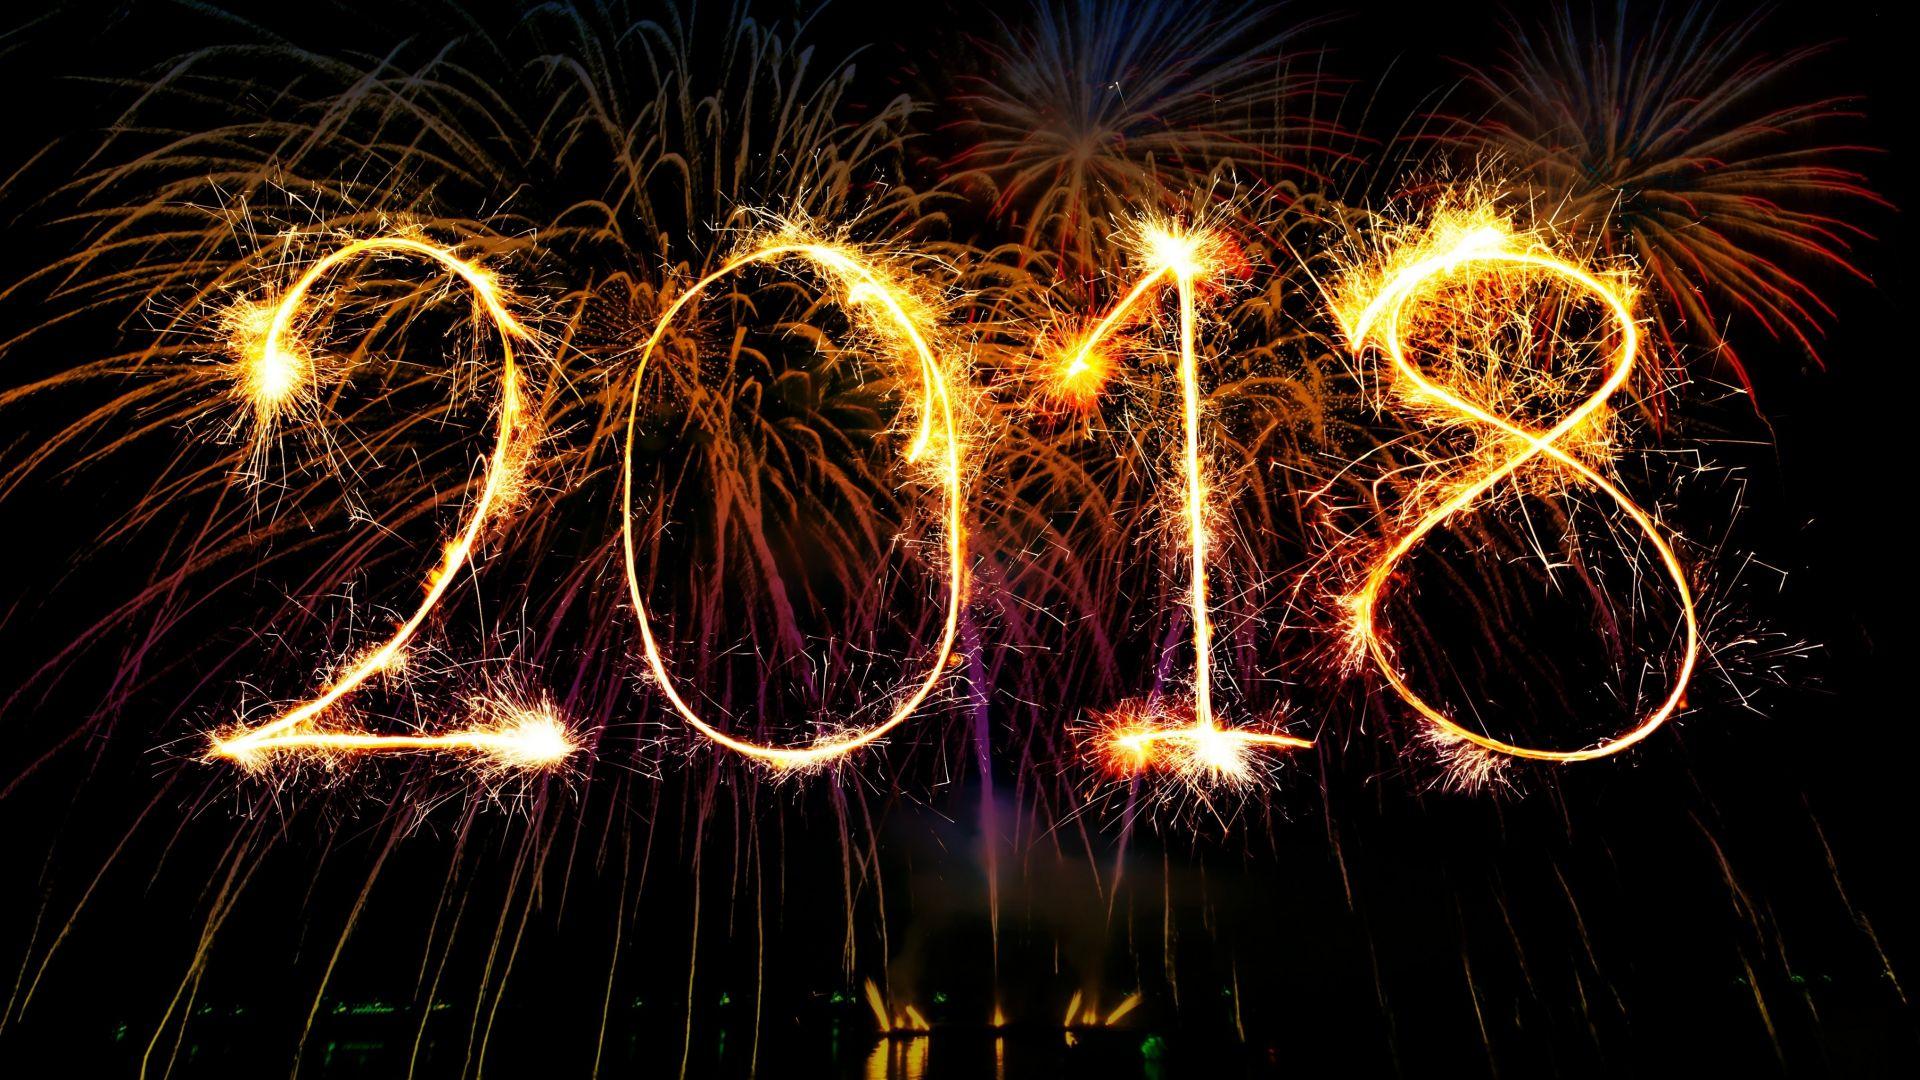 Wallpaper 2018, fireworks, celebrations, typography, happy new year, 4k